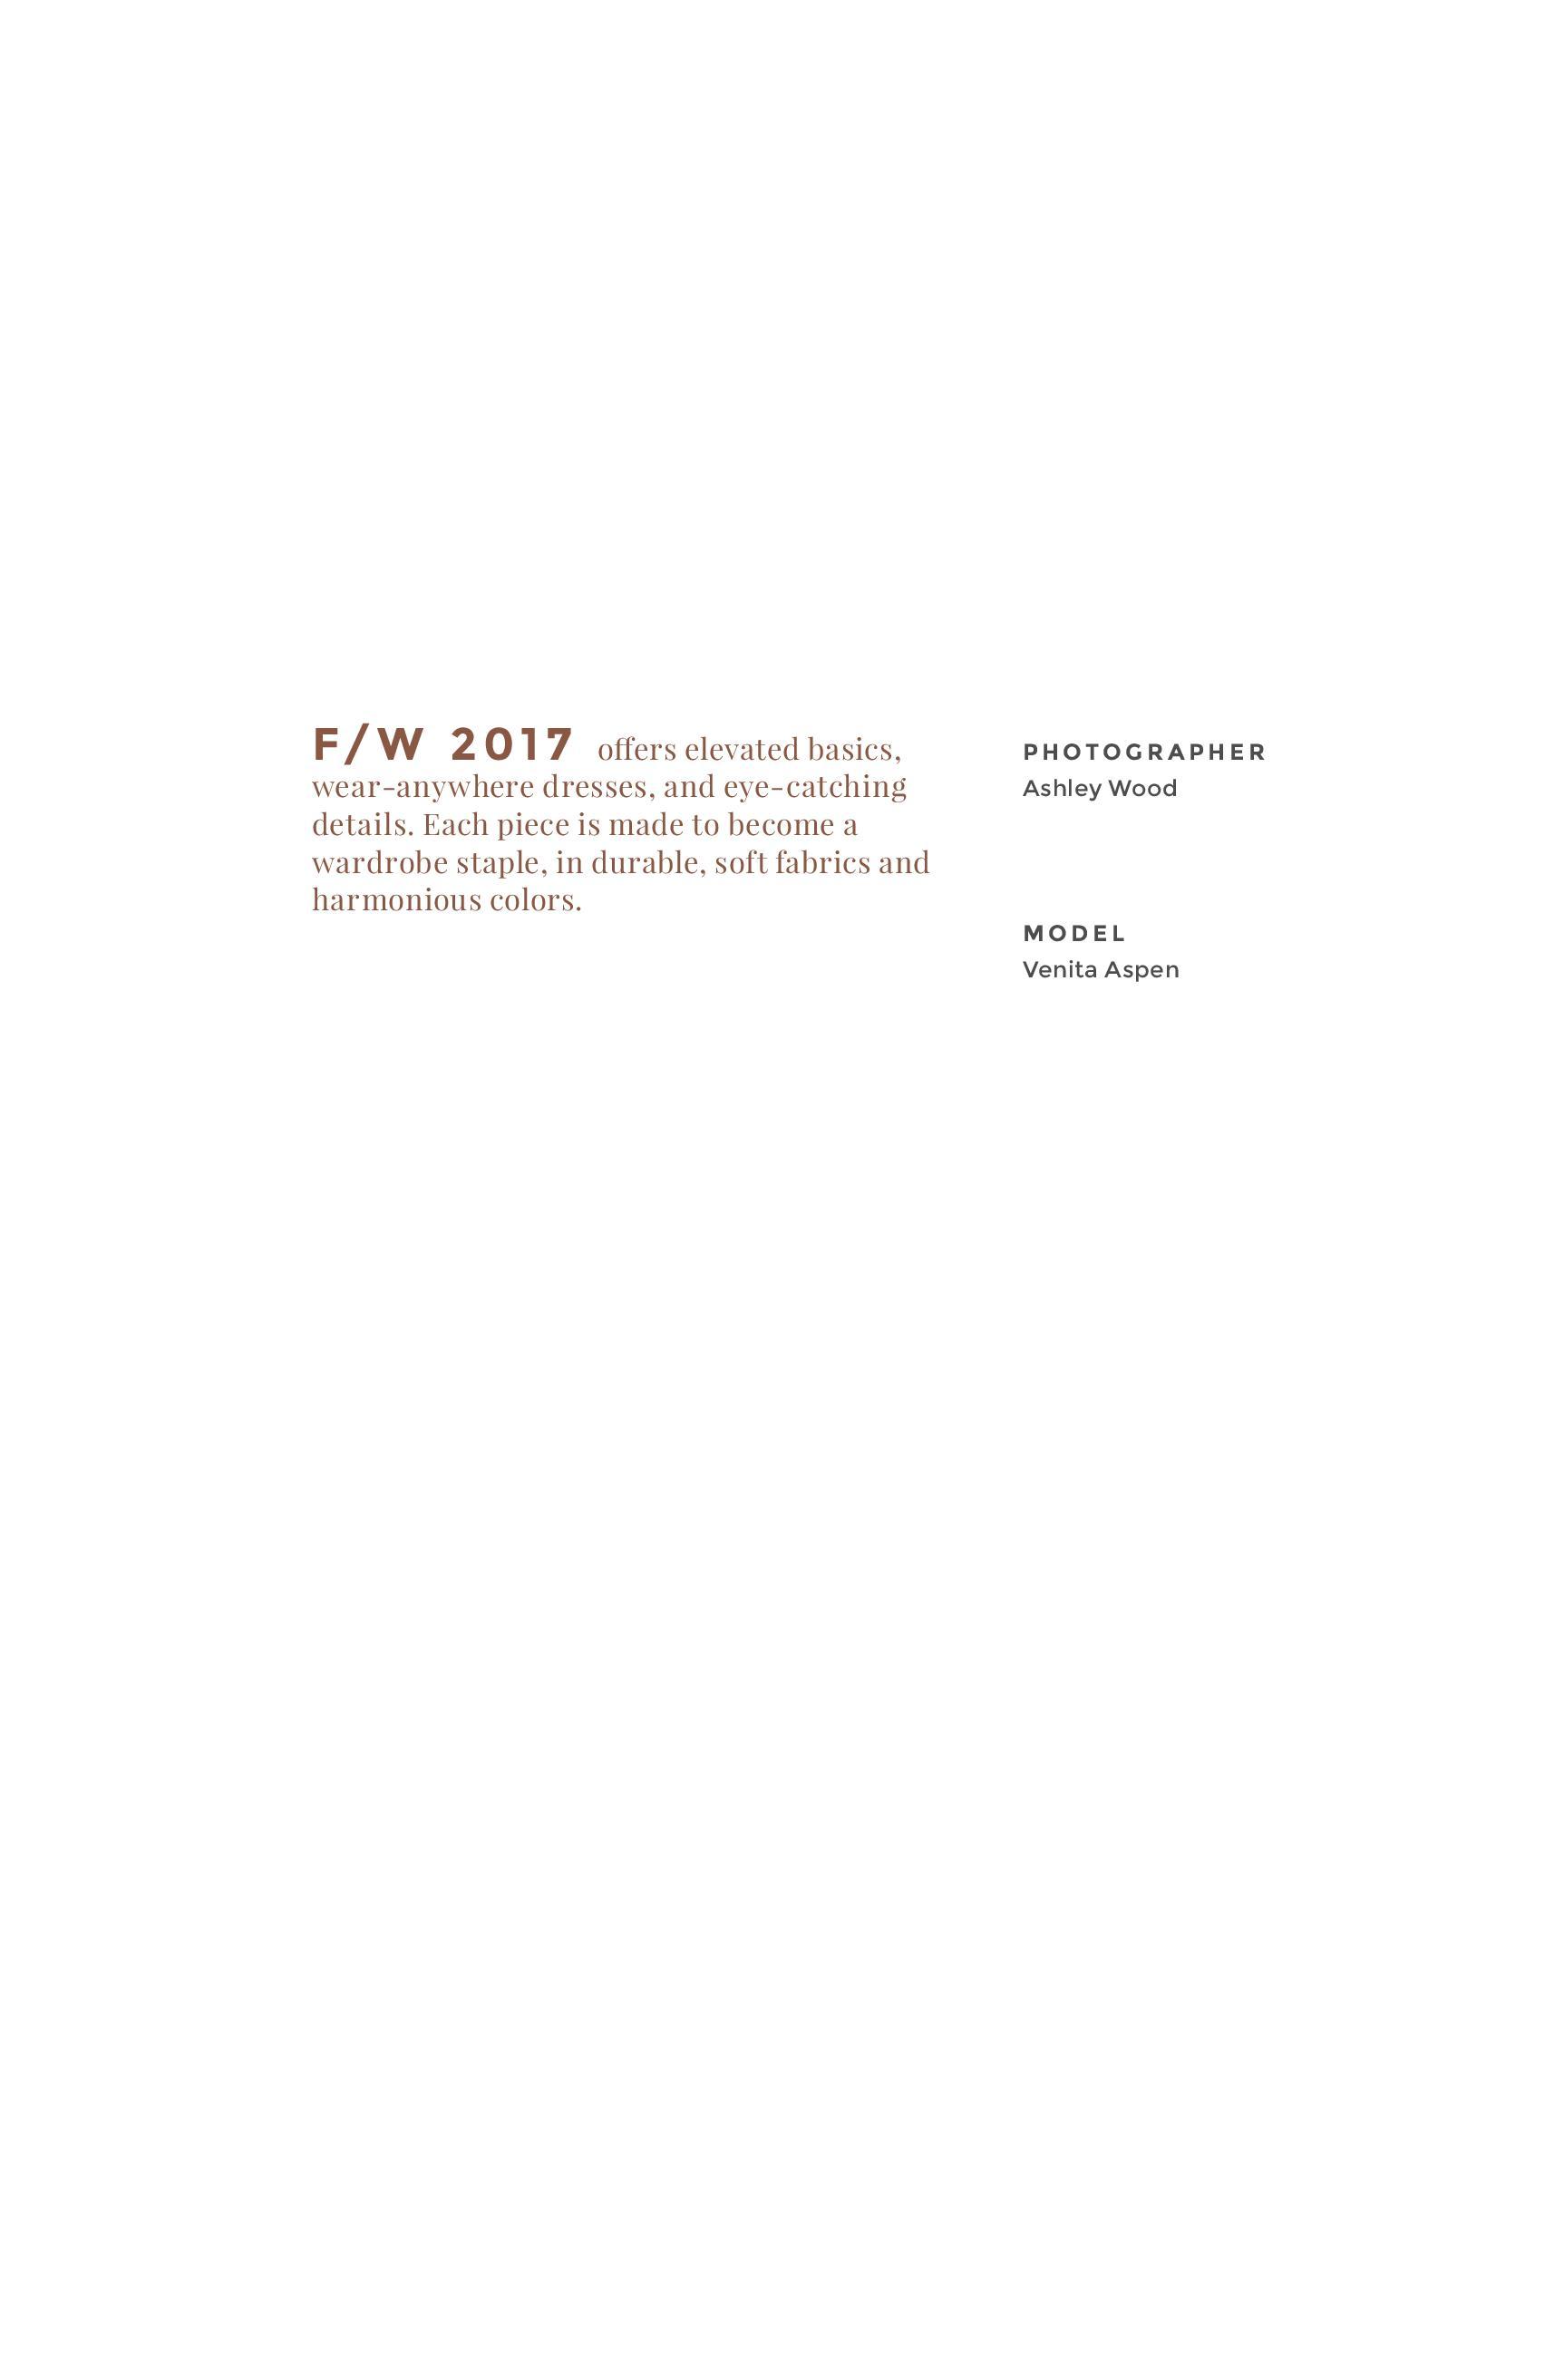 FW17 LookBook-page-002.jpg